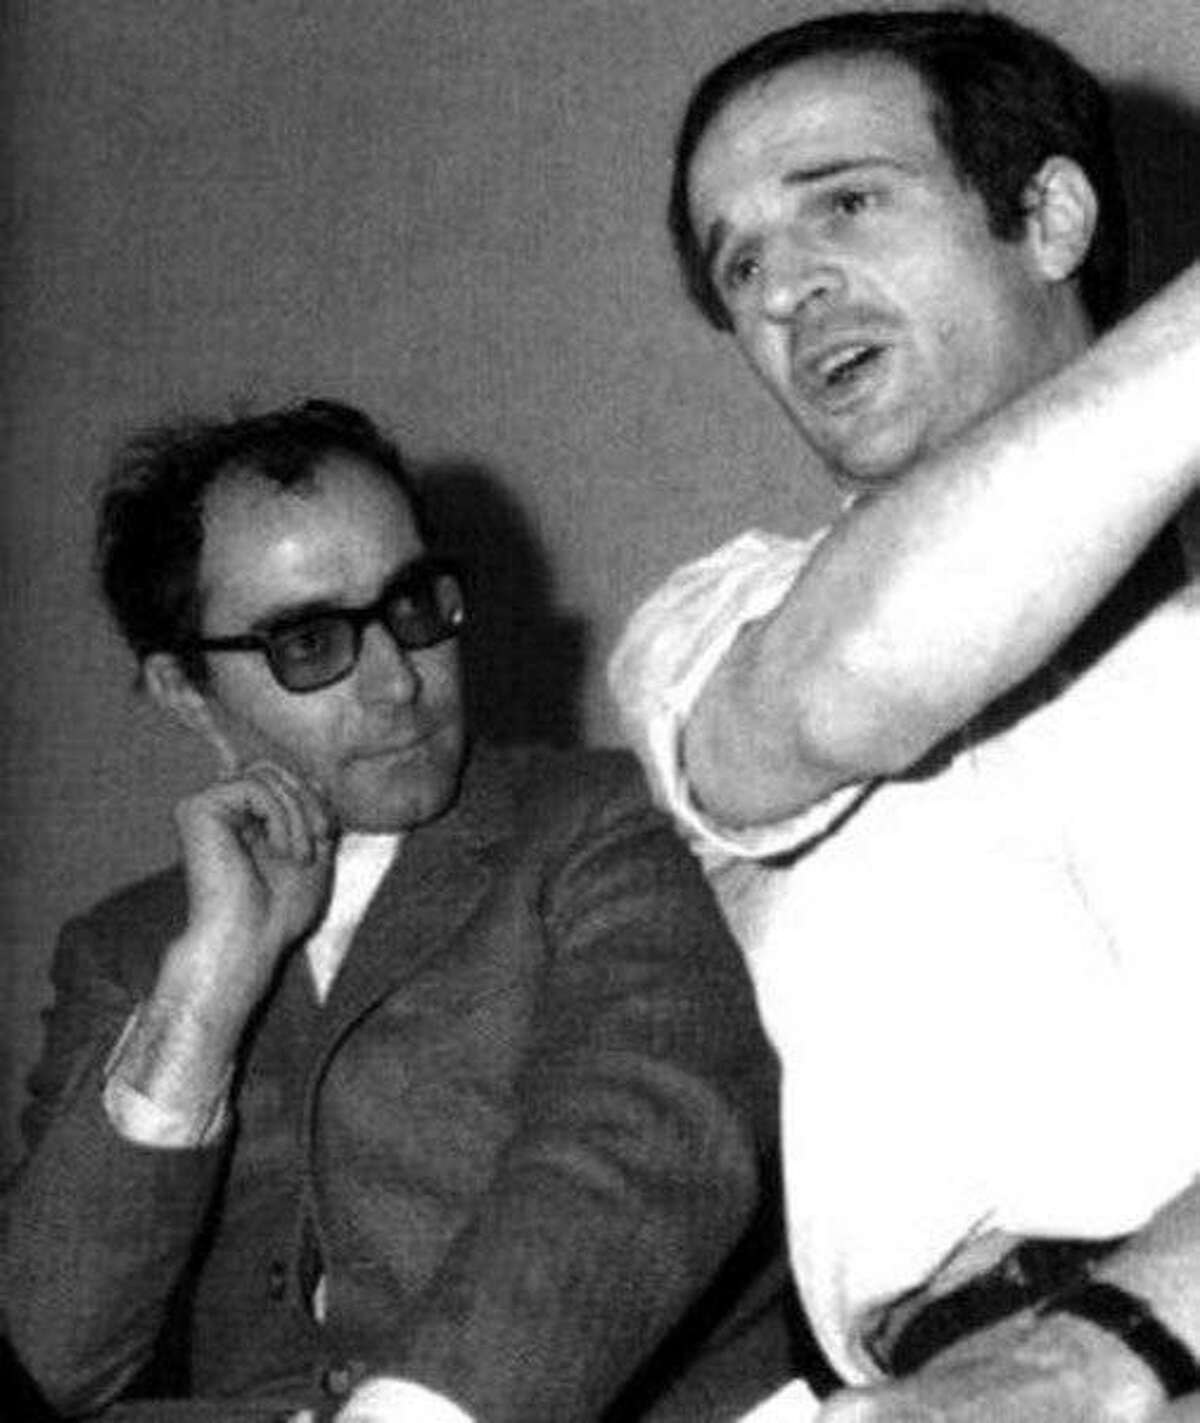 Jean-Luc Godard and Francois Truffaut from,